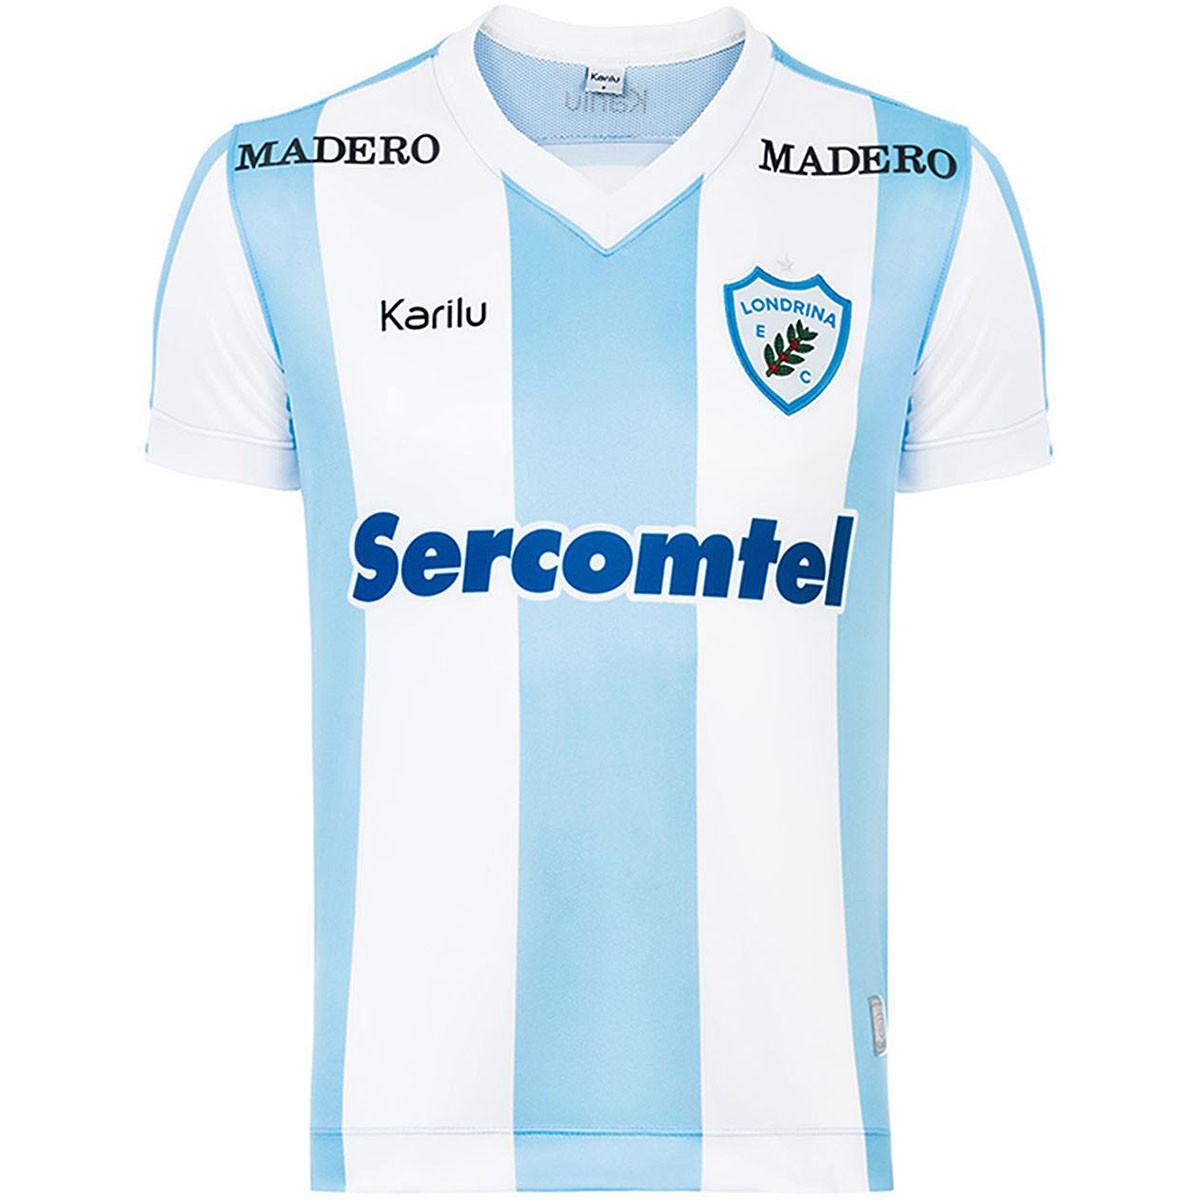 Camisa Karilu Londrina Oficial  f255bf839f9c1